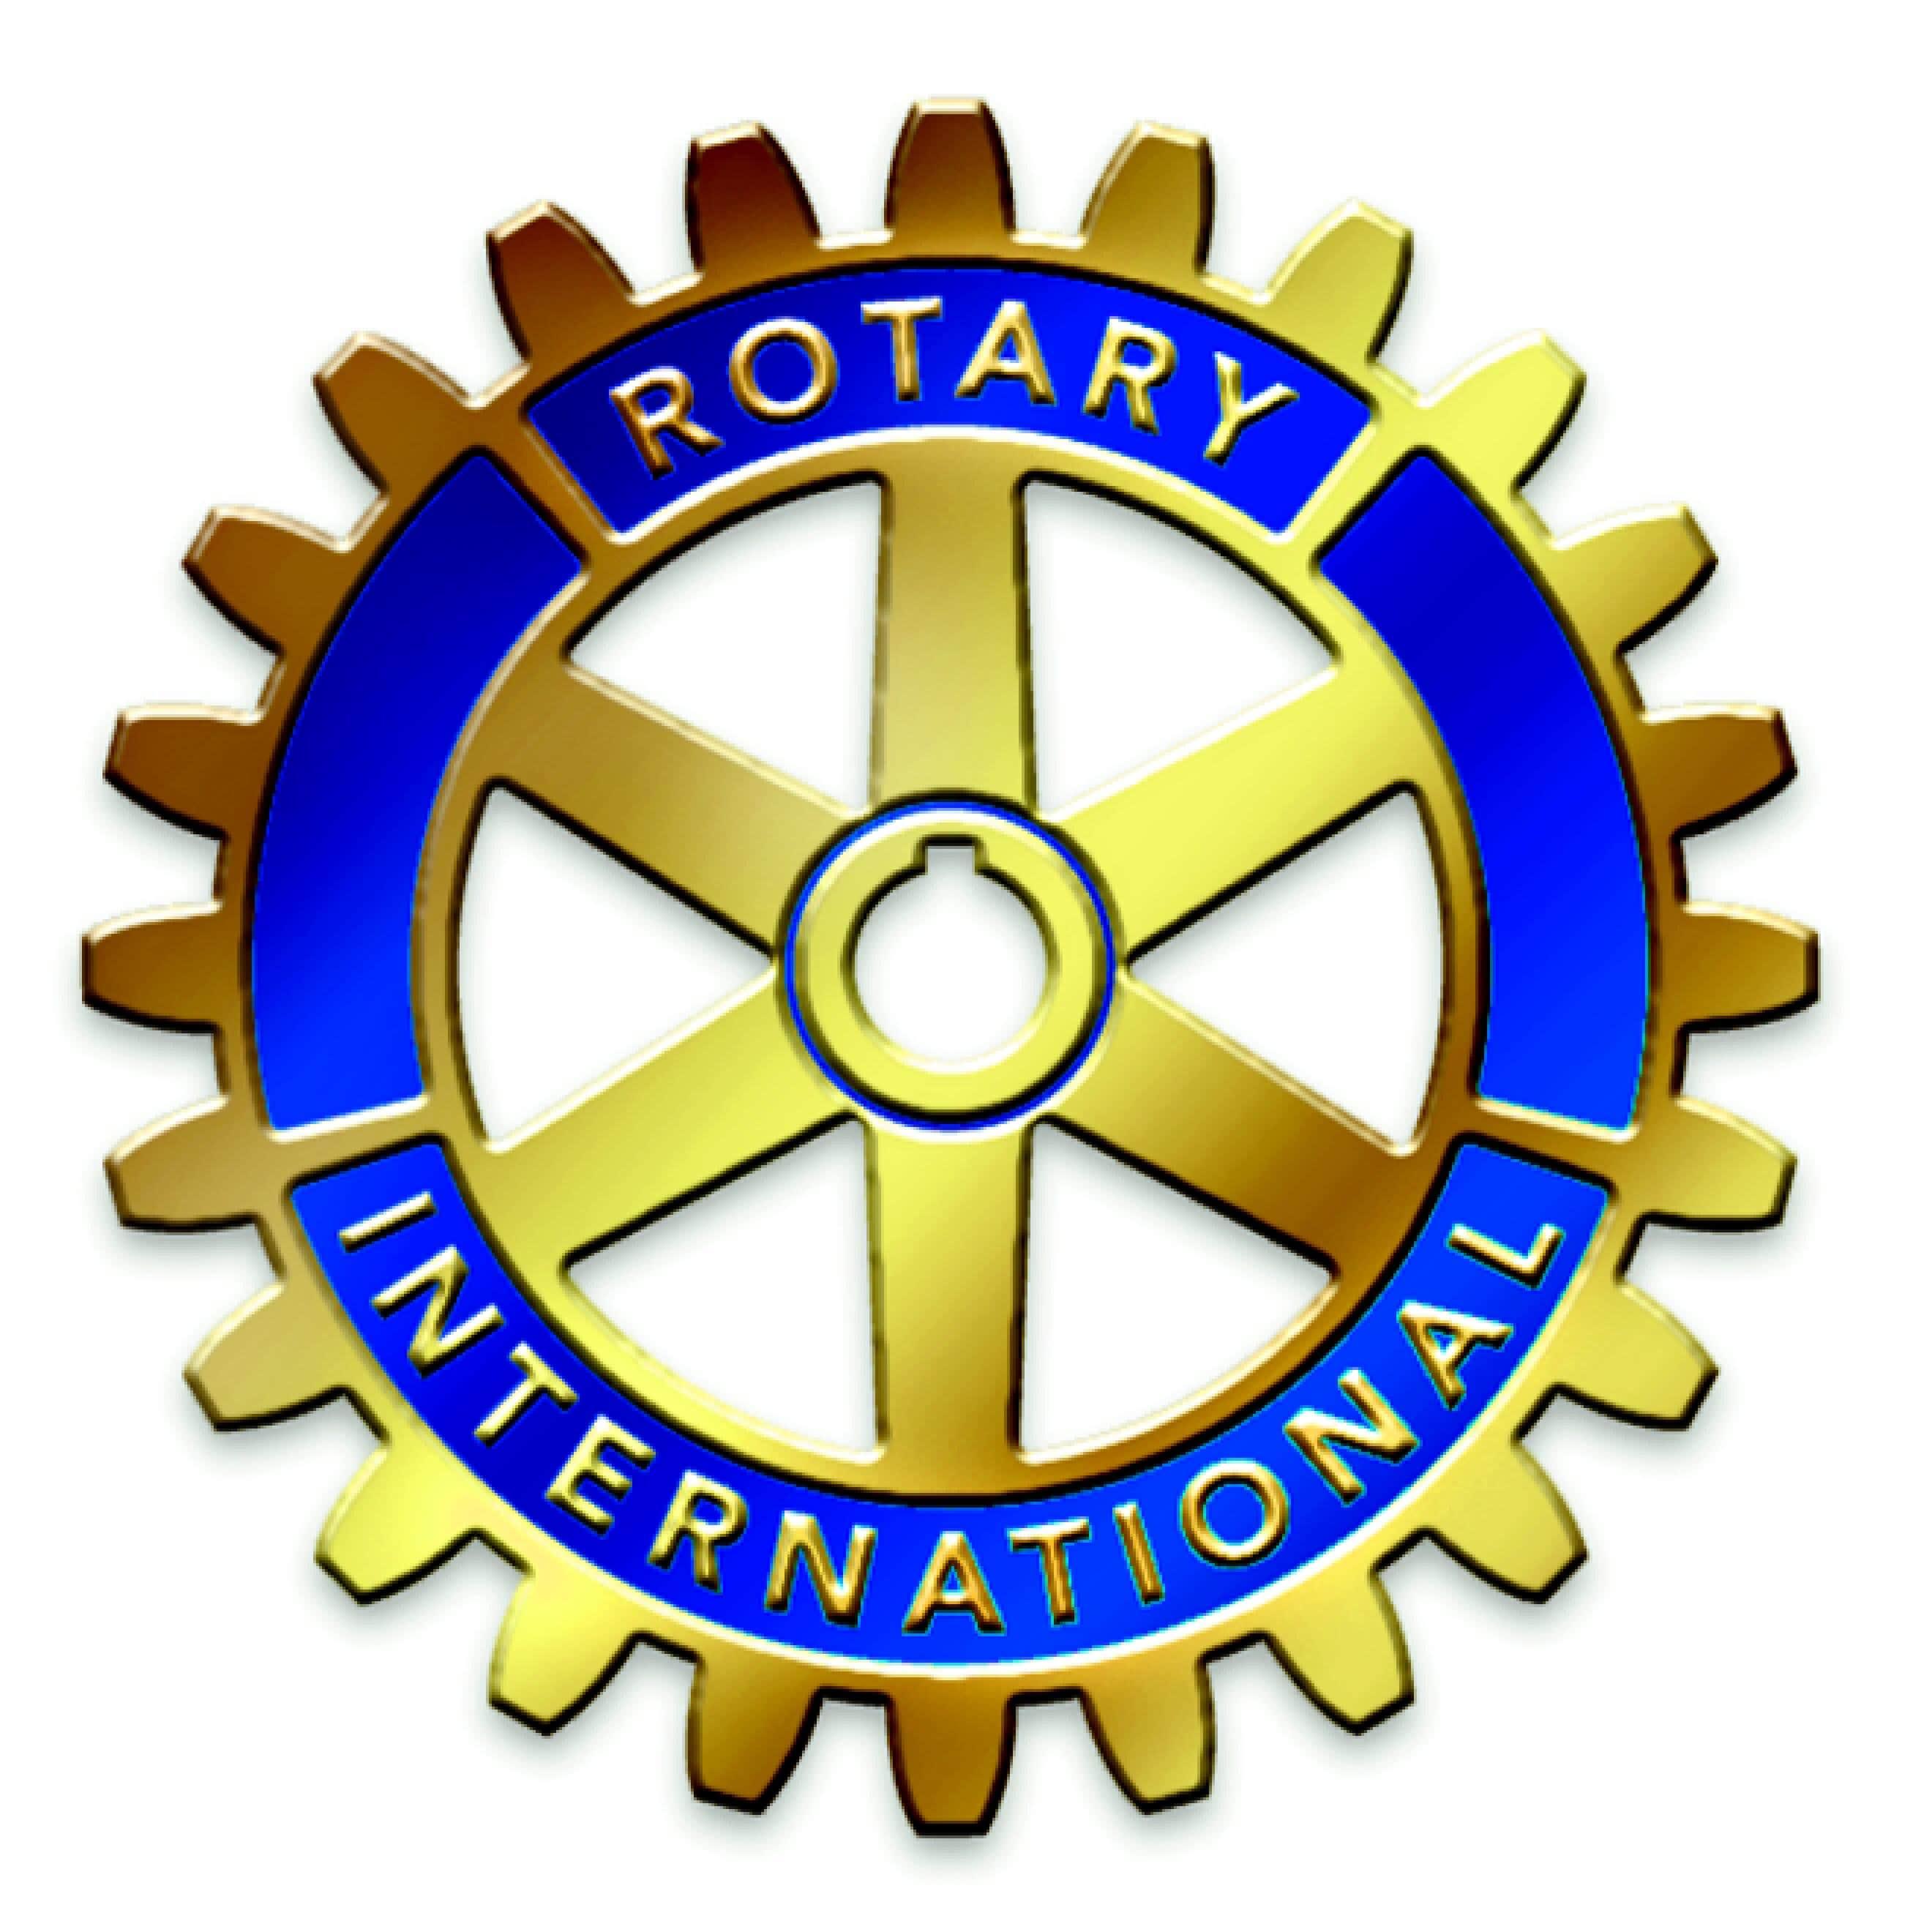 Vortrag Storytelling Rotary Club Berlin